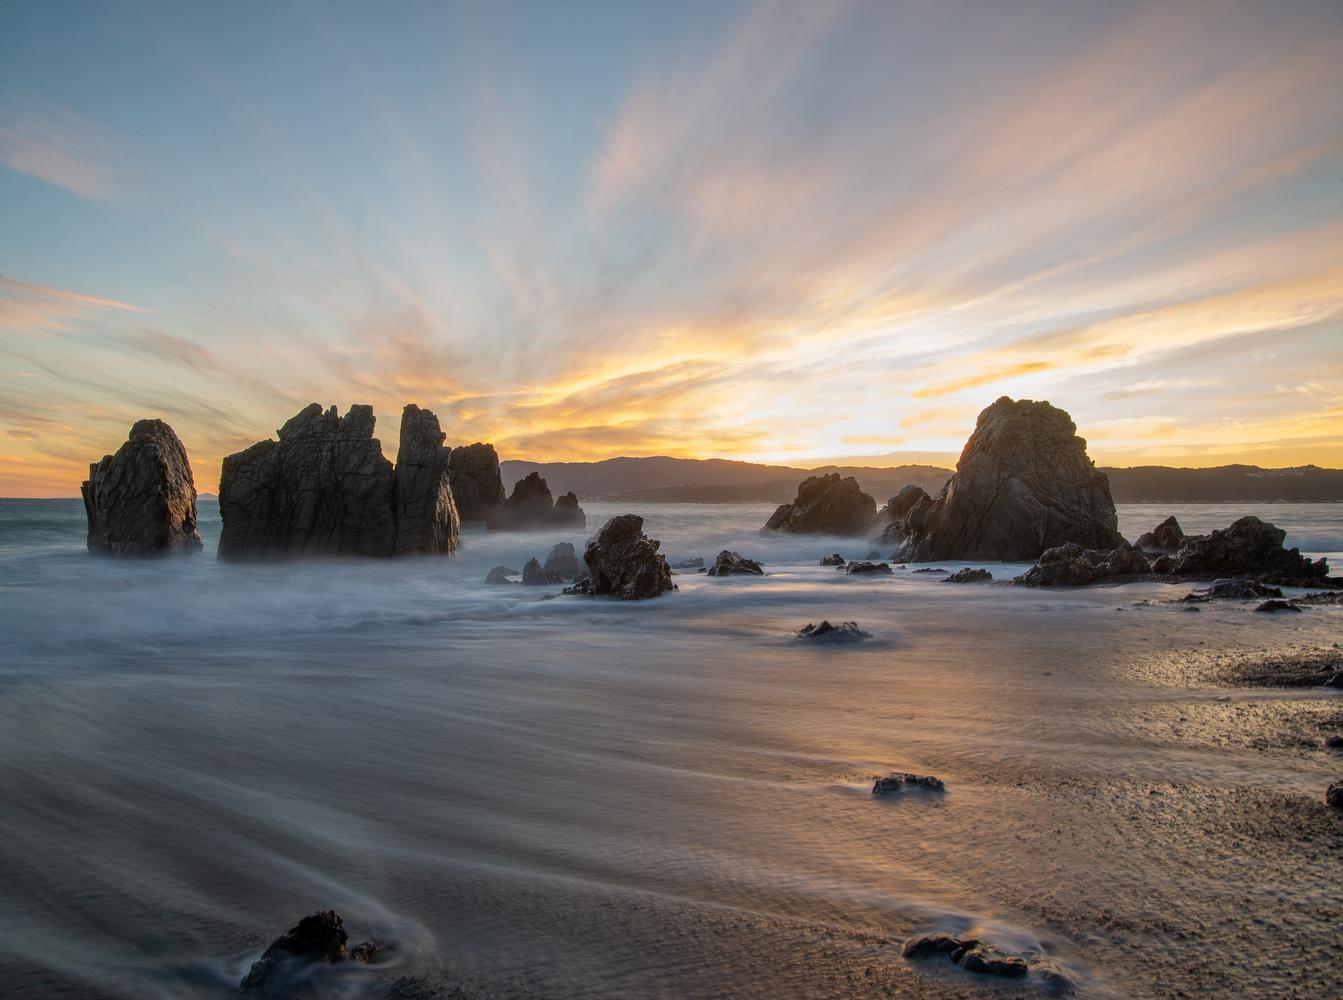 Pencarrow Head Sunset by Tom Minton